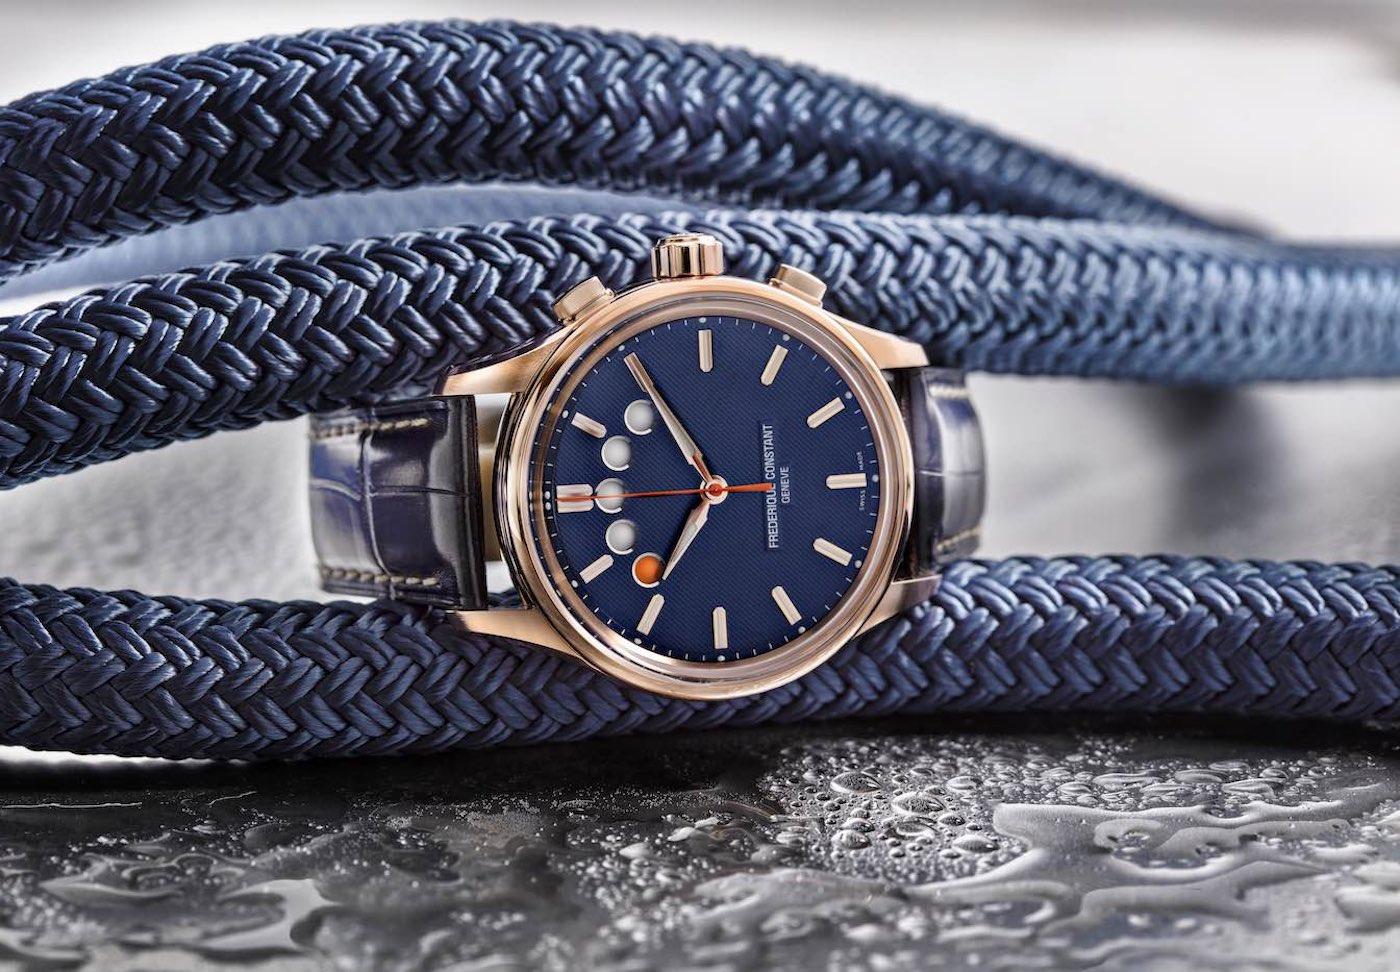 đồng hồ bấm giờ du thuyền Frederique Constant Yacht Timer Regatta Countdown